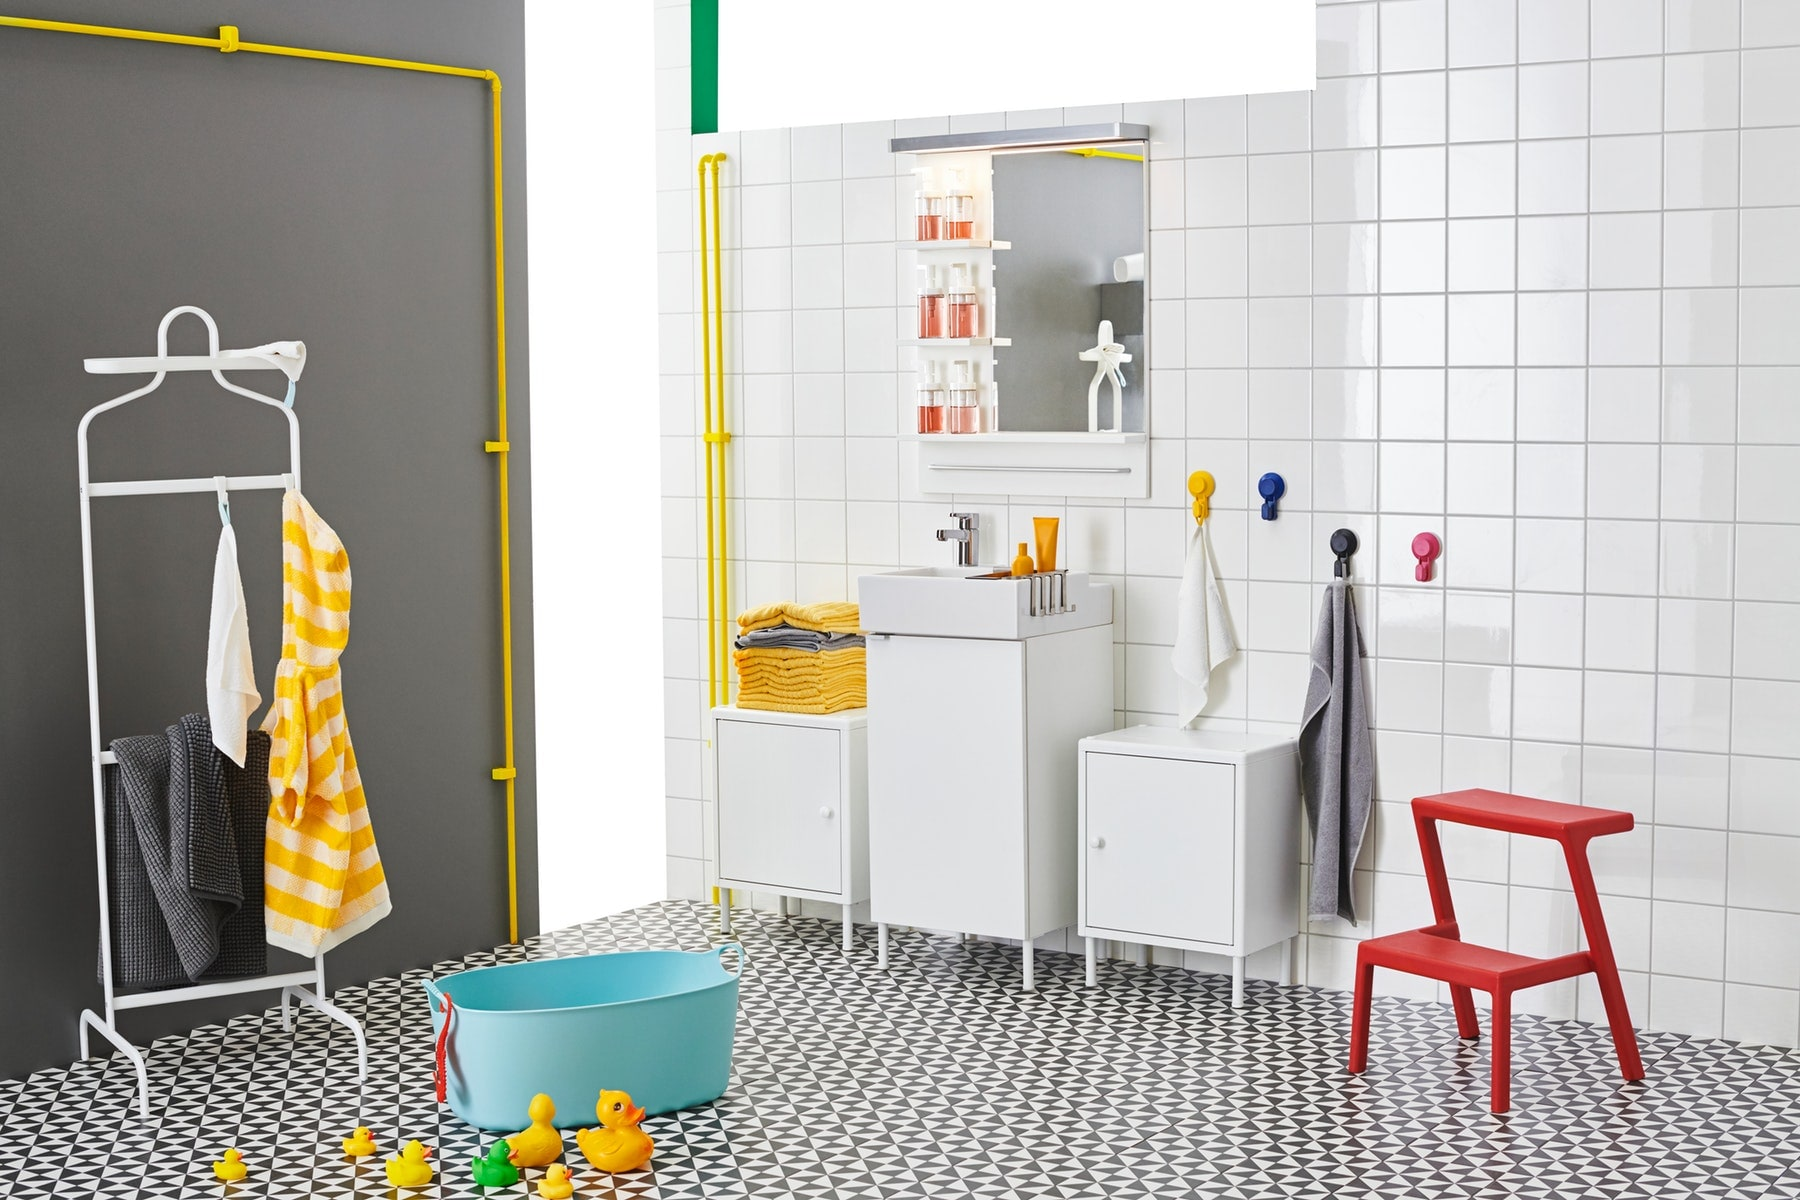 10 creative and unique bathroom design ideas